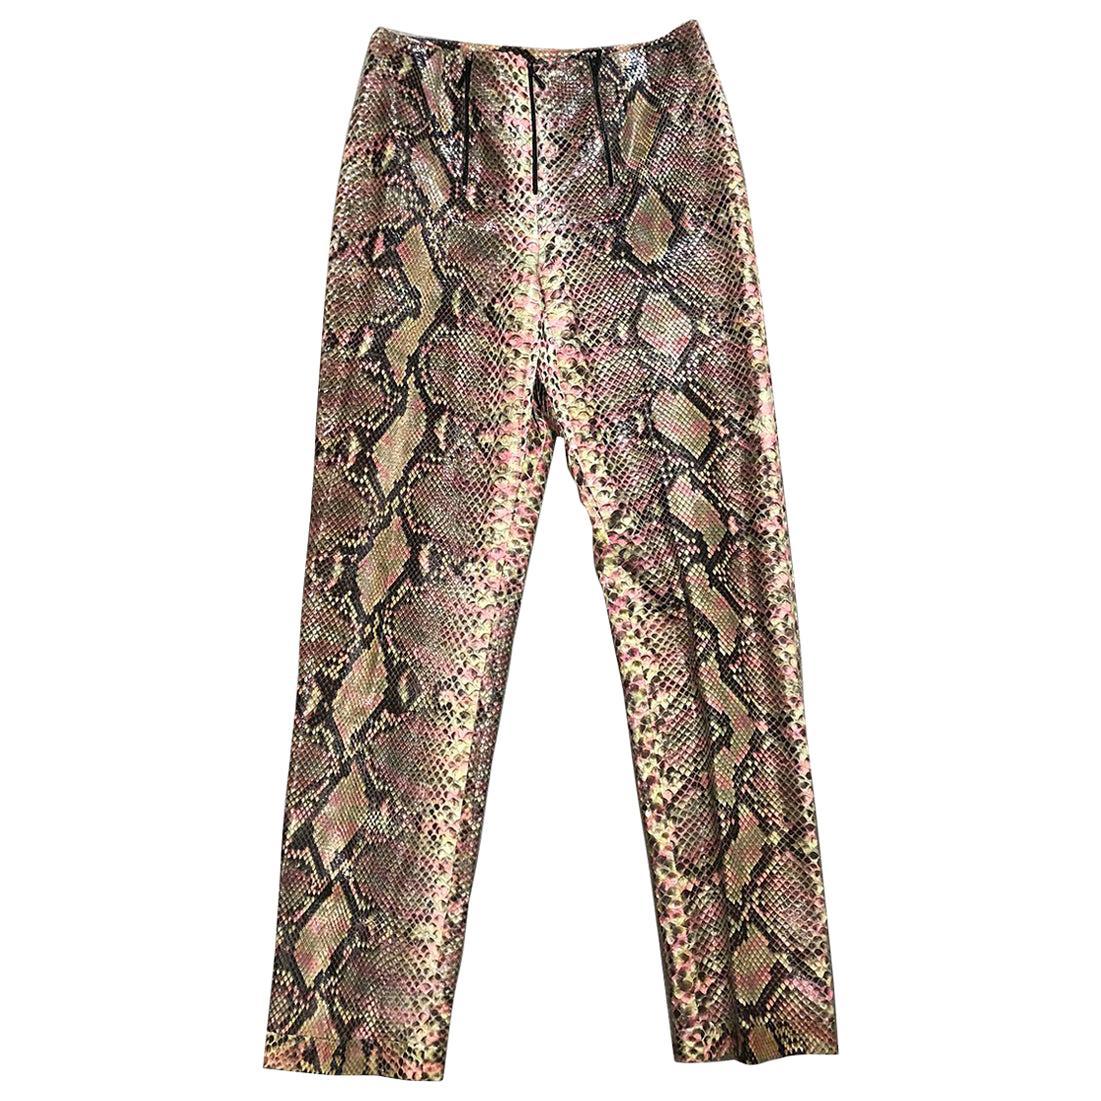 Chanel Python Snakeskin Multicolor Pants